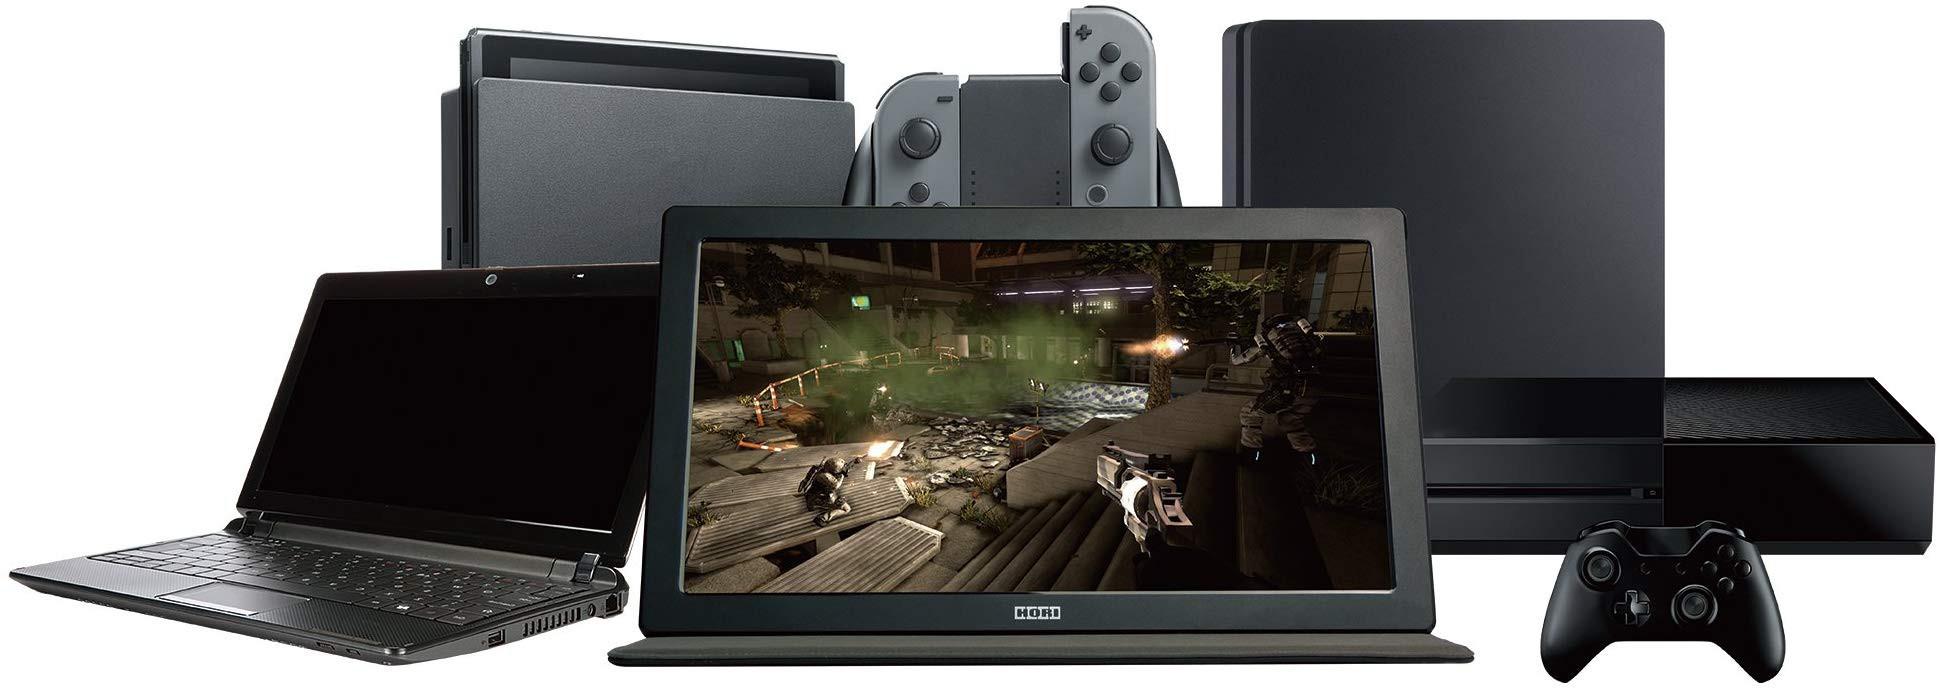 HORI mobile HD gaming monitorius | 15.6 colio